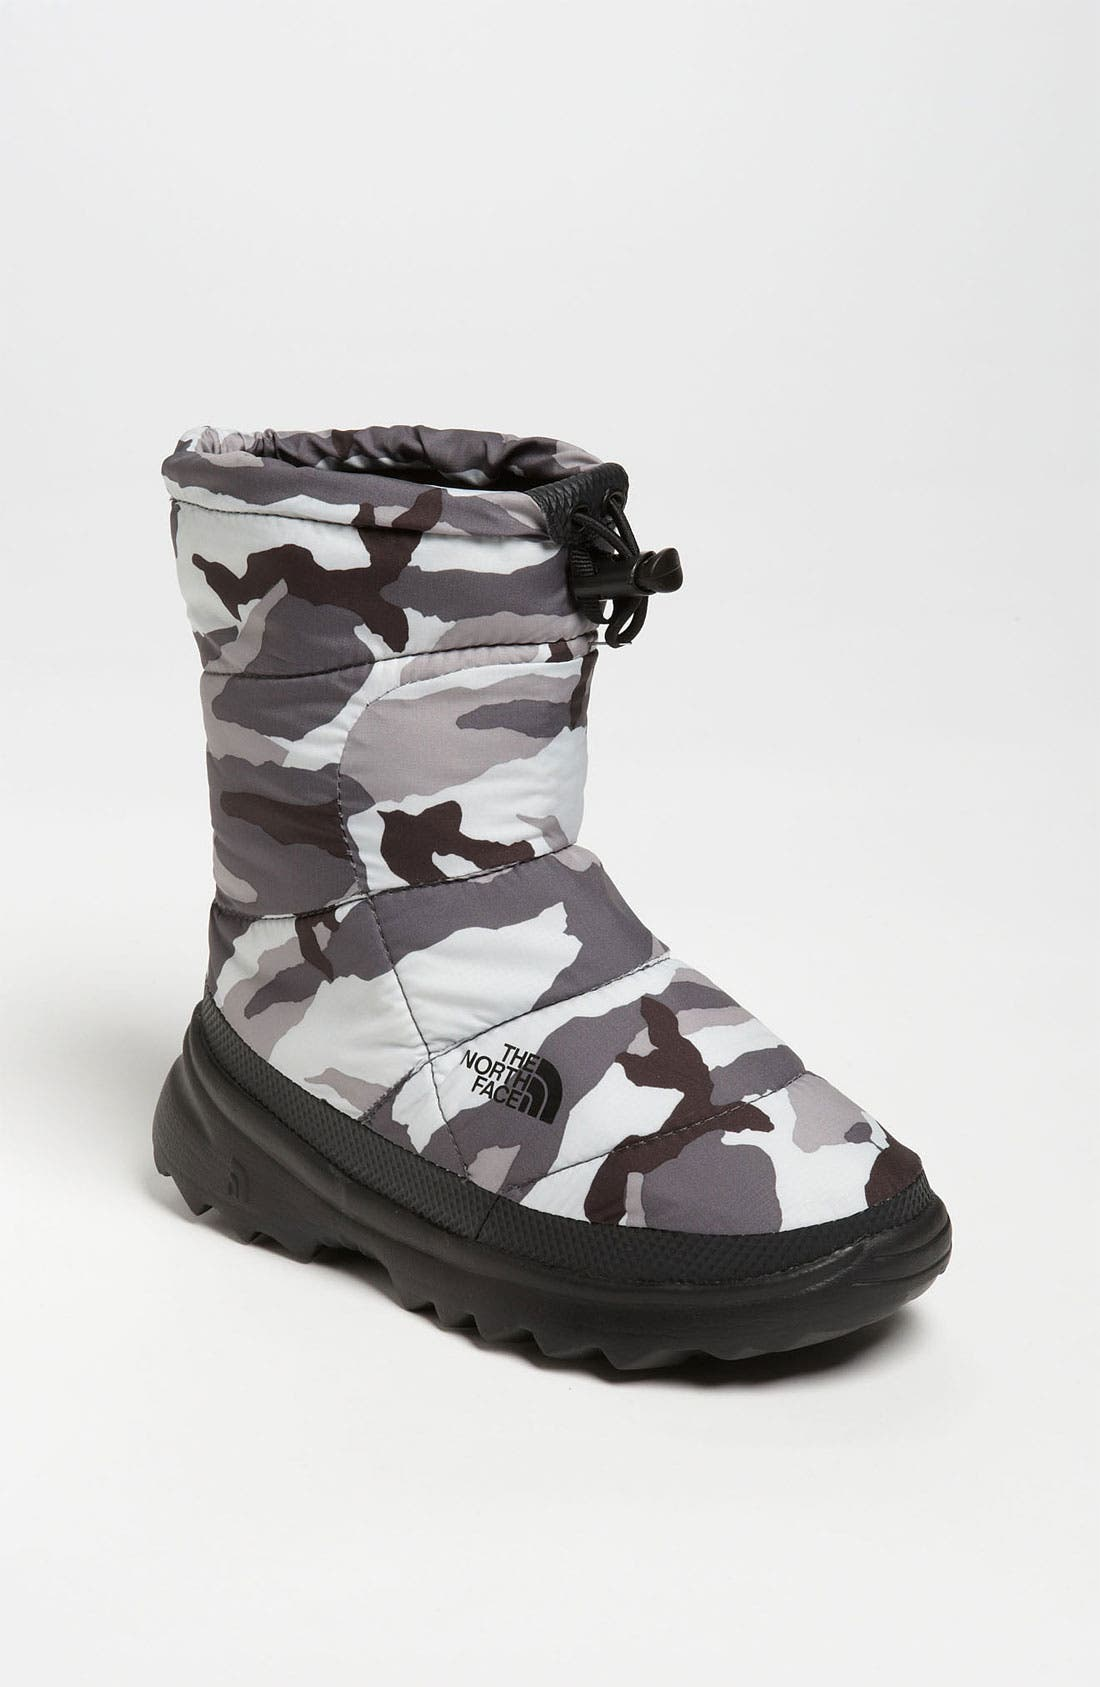 Main Image - The North Face 'Nuptse' Boot (Little Kid & Big Kid)